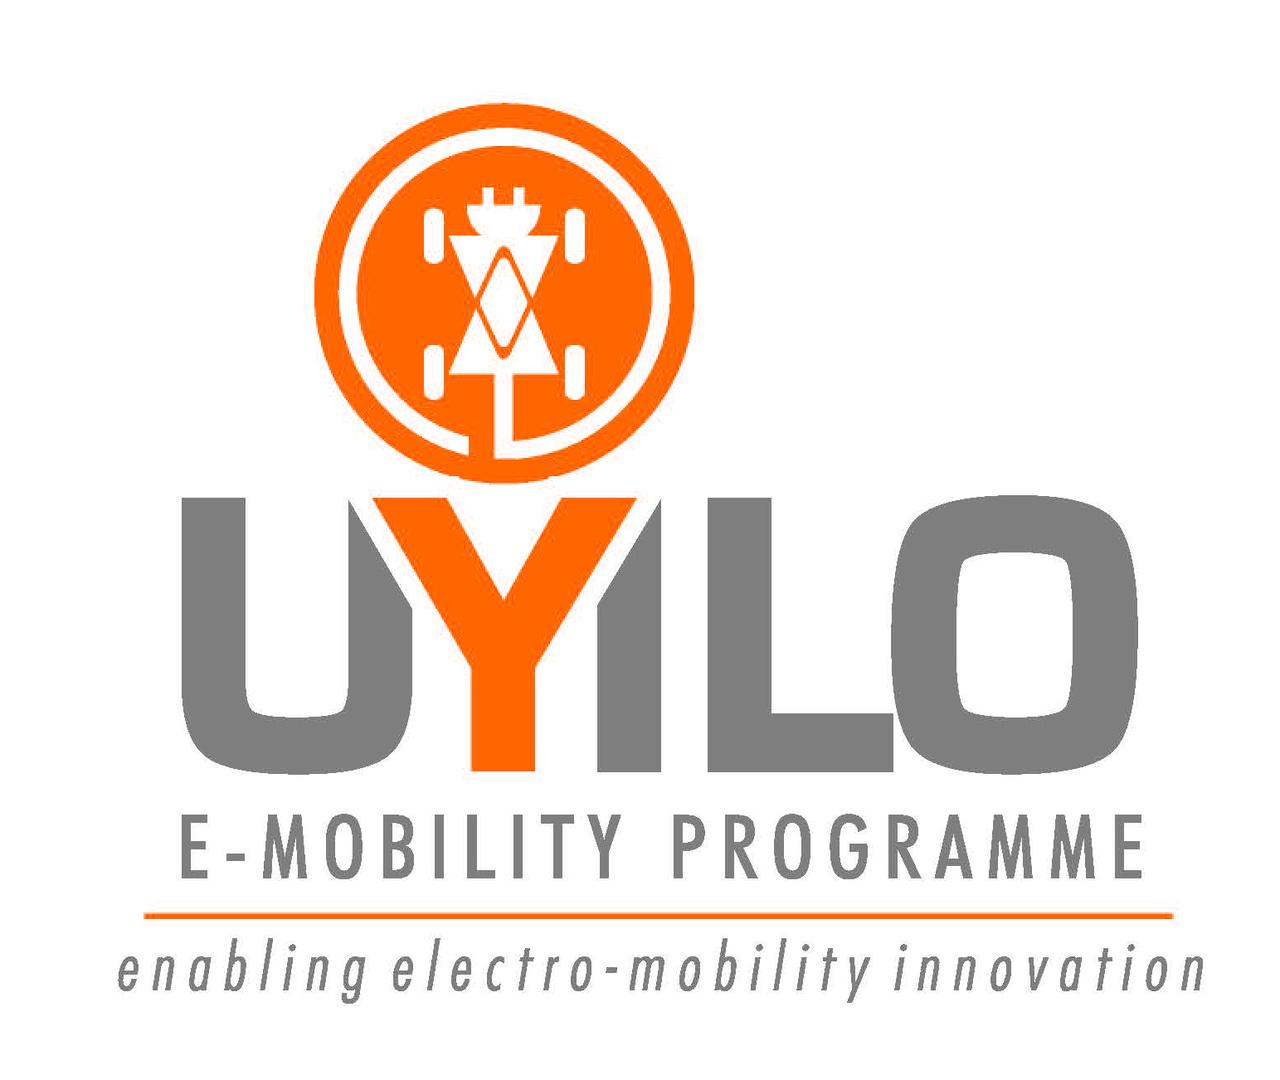 uYilo E-Mobility